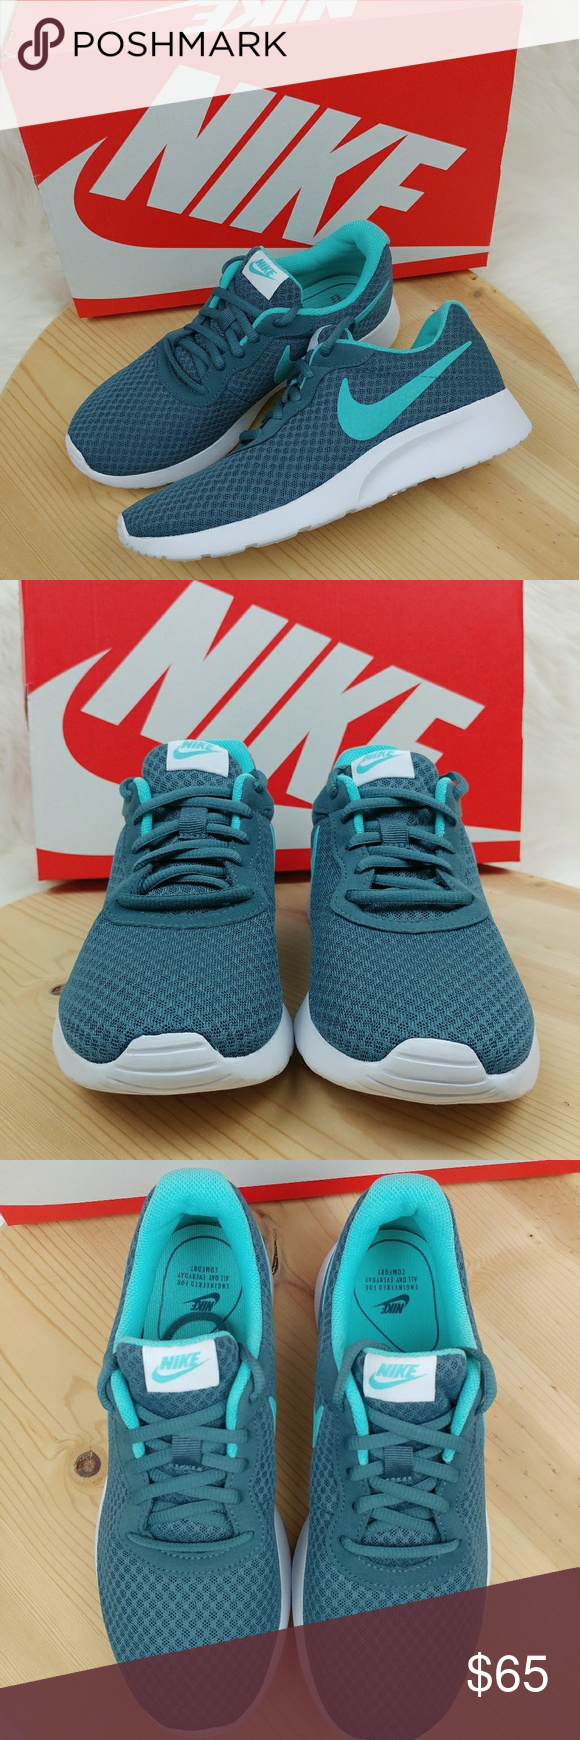 52eb9169498d Nike Tanjun Iced Jade Aurora Green-White sneakers New comes with box. Nike  Tanjun Iced Jade  Aurora Green-White Teal sneakers Womens size 8 25 cm Nike  Shoes ...